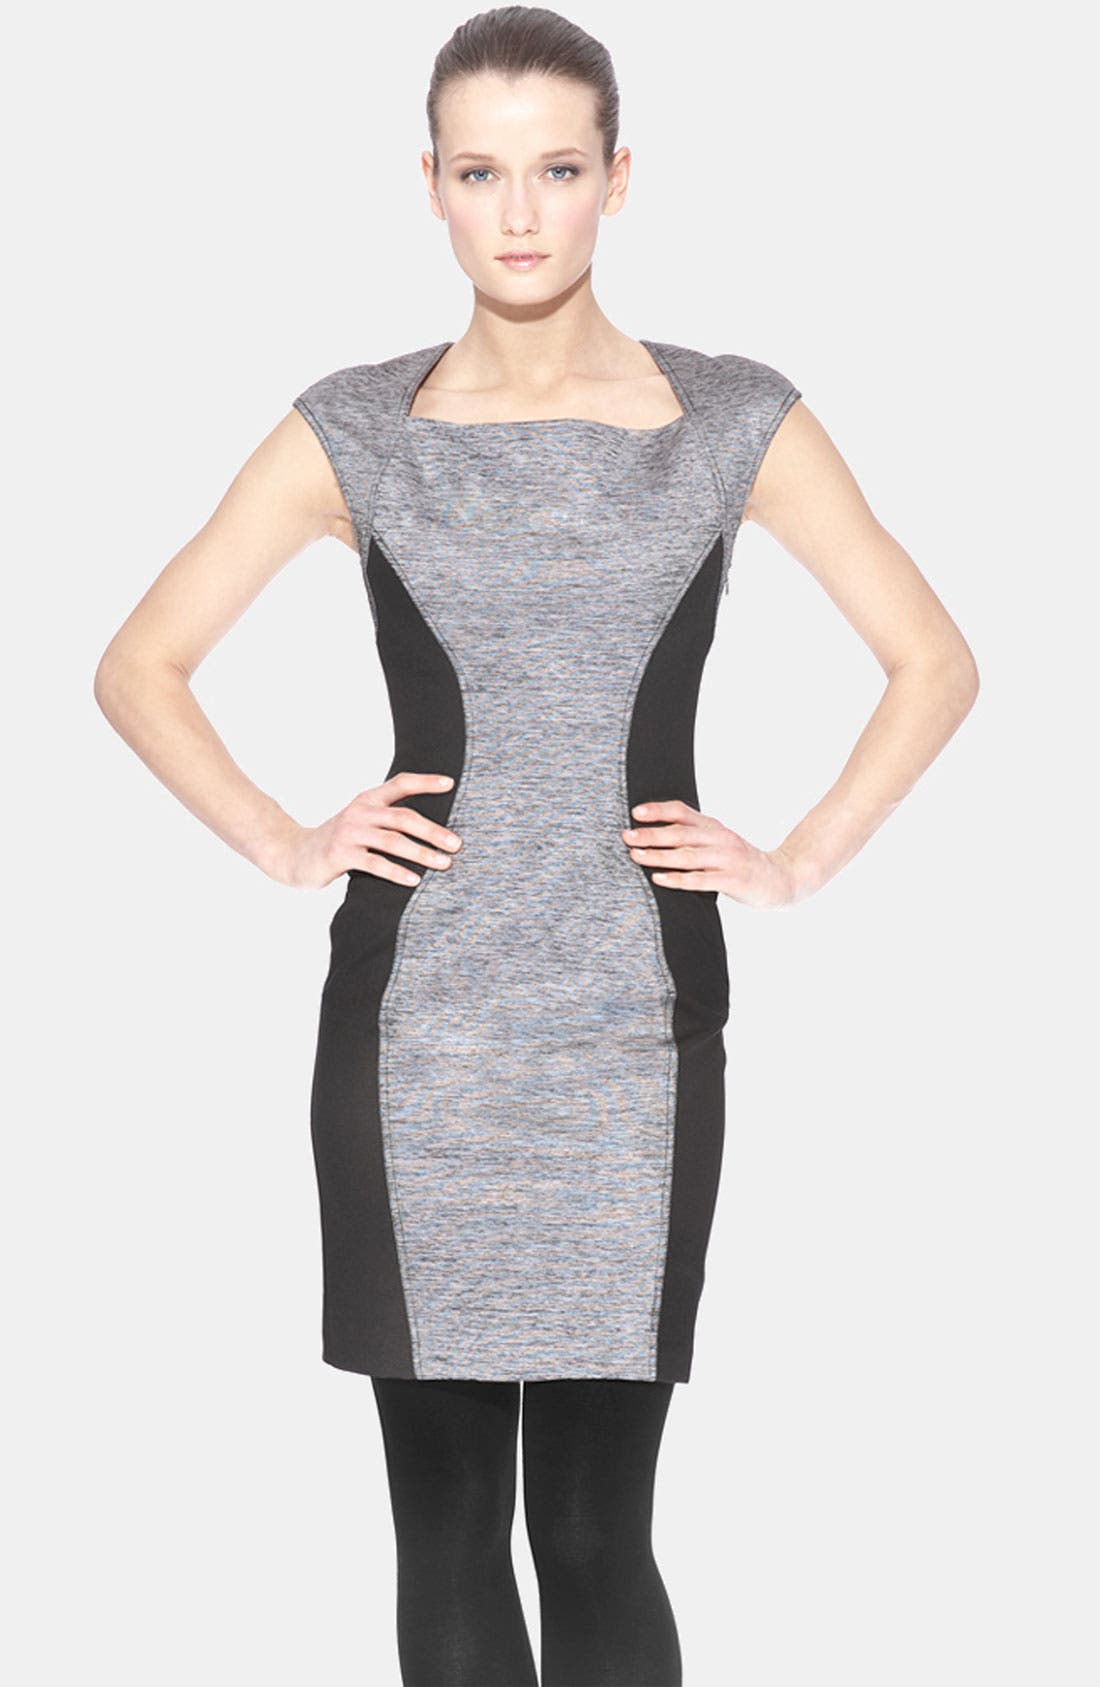 Alternate Image 1 Selected - Marc New York Contrast Inset Mixed Media Sheath Dress